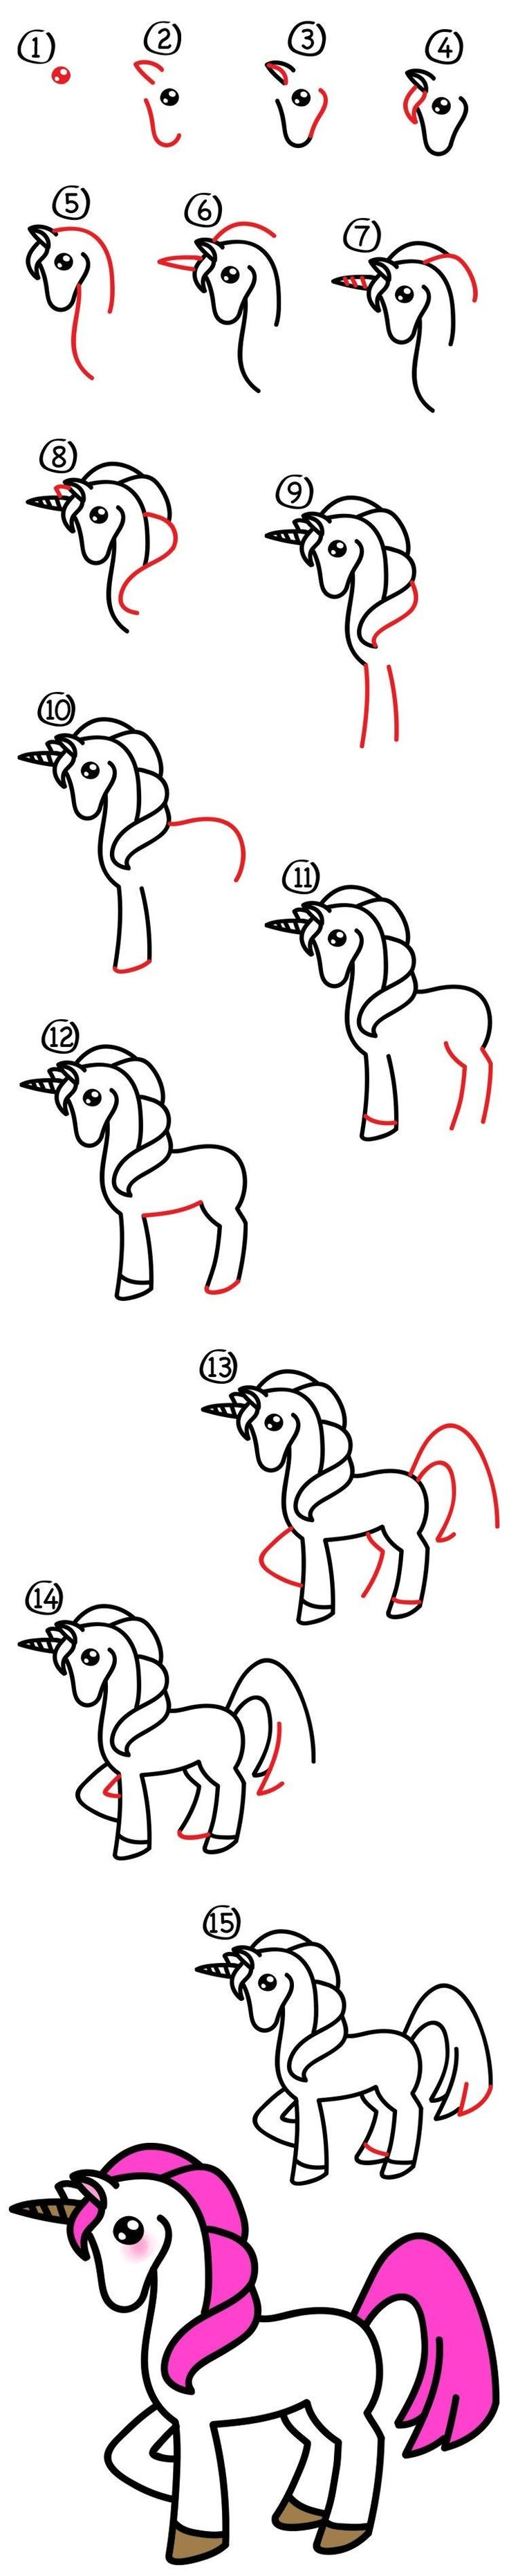 Cum s-a desenezi sau chestii făcute cum s-a le faci